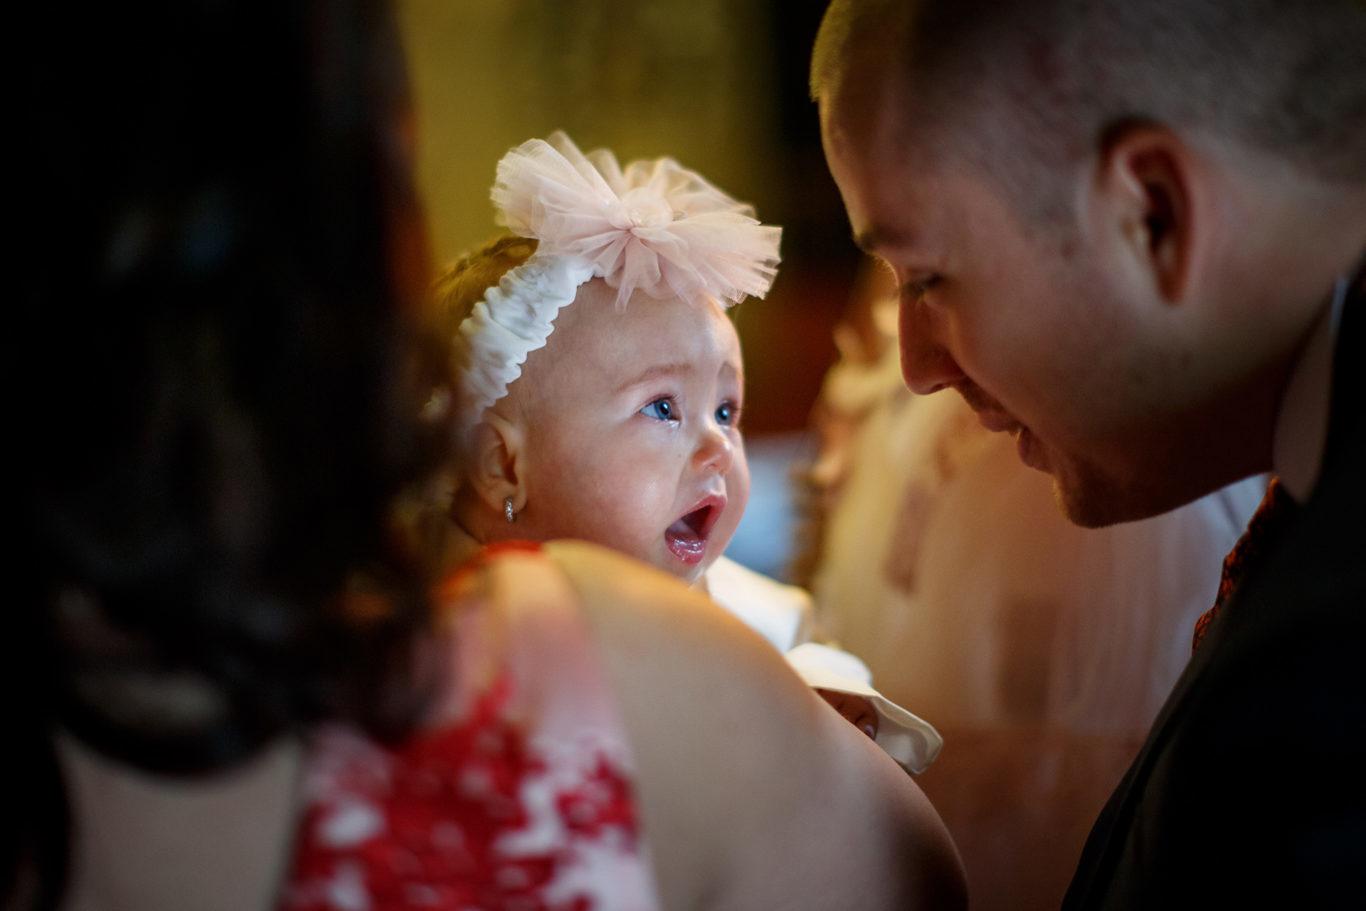 Botez cu printese - Annelise - fotograf de familie - fotograf Ciprian Dumitrescu